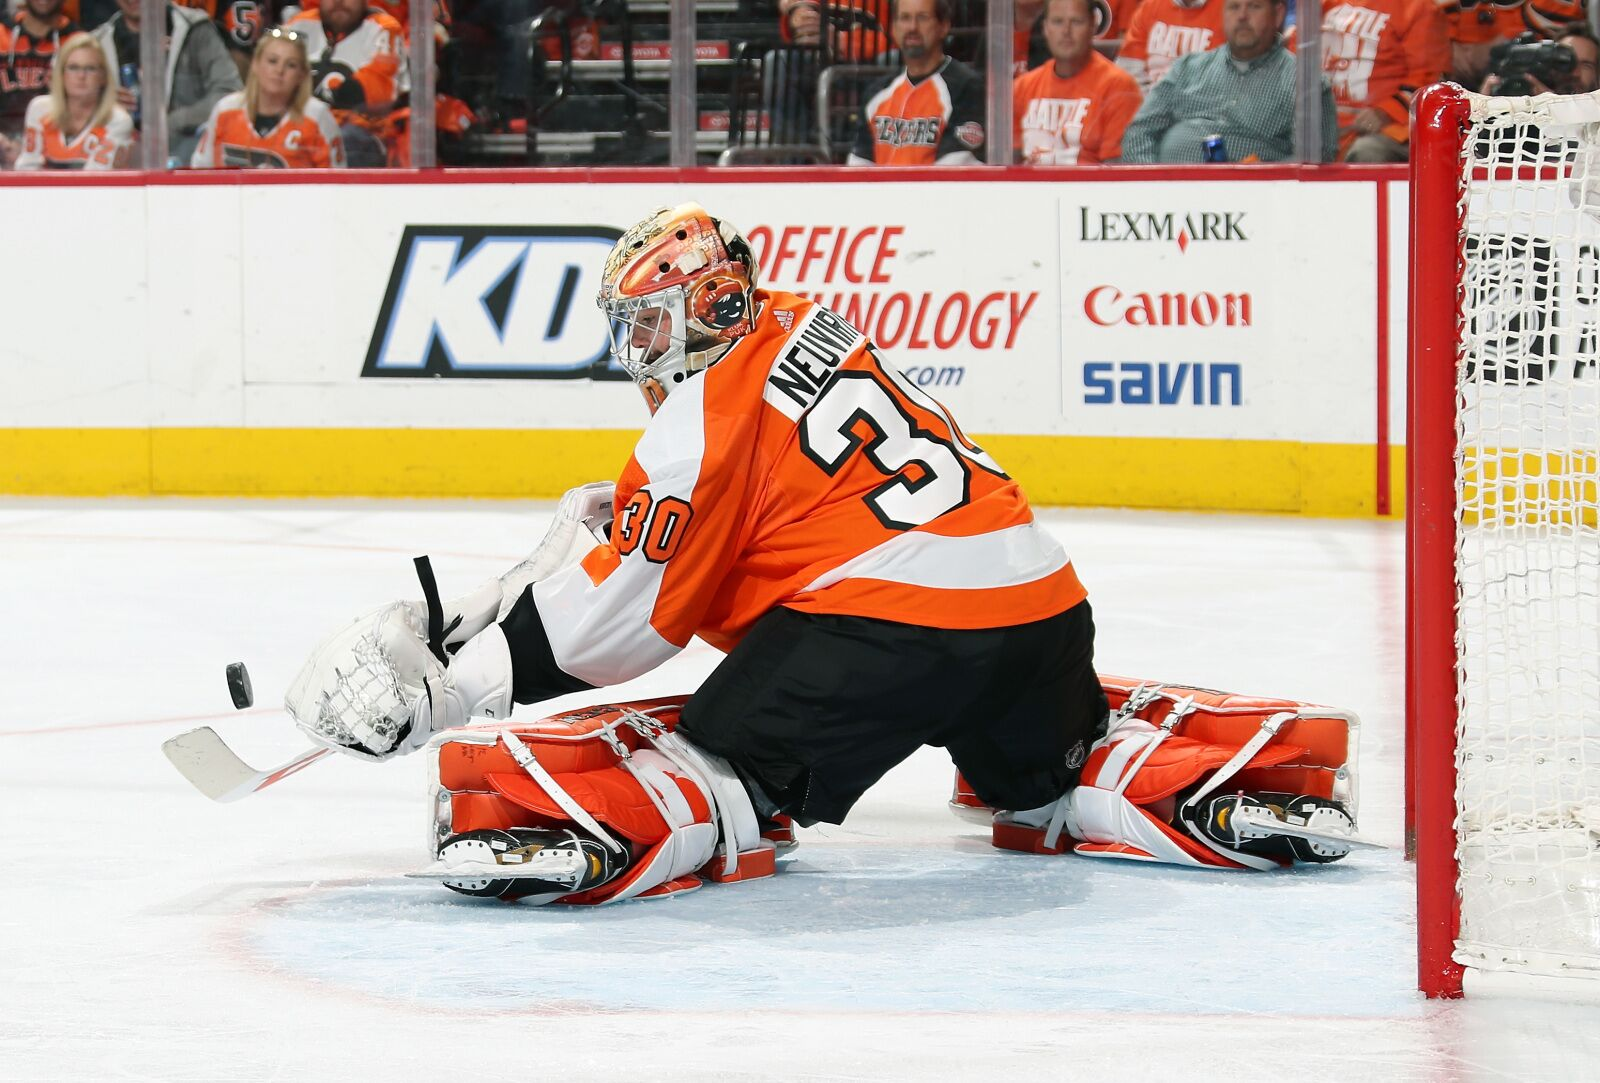 Michal Neuvirth will start for Philadelphia Flyers vs Islanders